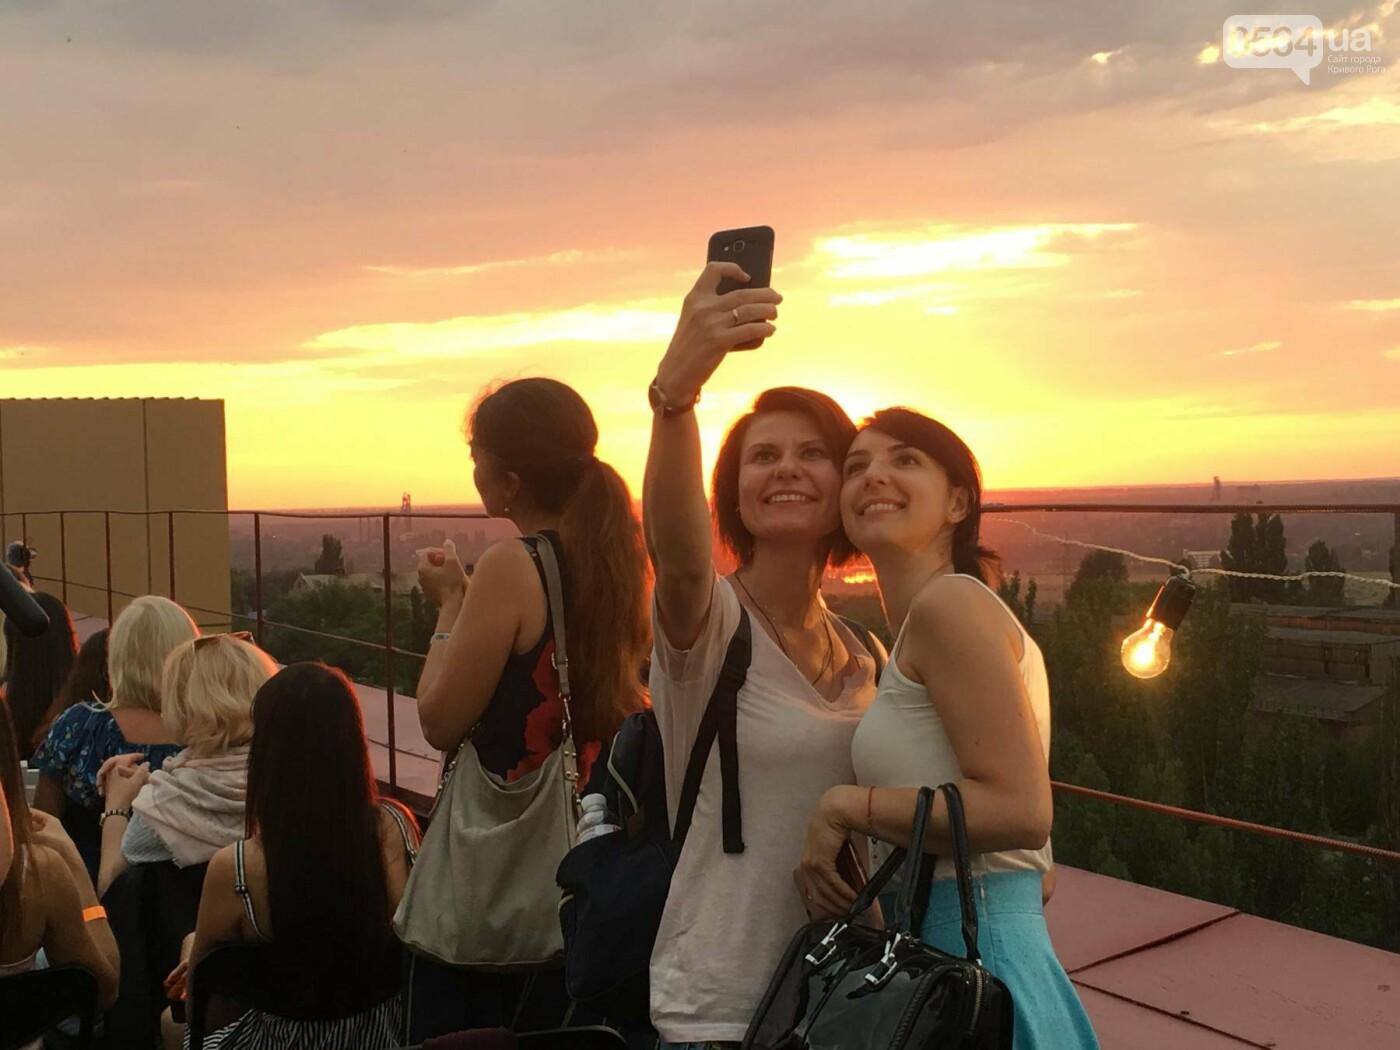 Сотни криворожан встречали закат на крыше отеля под мелодии джаза, - ФОТО, ВИДЕО, фото-11